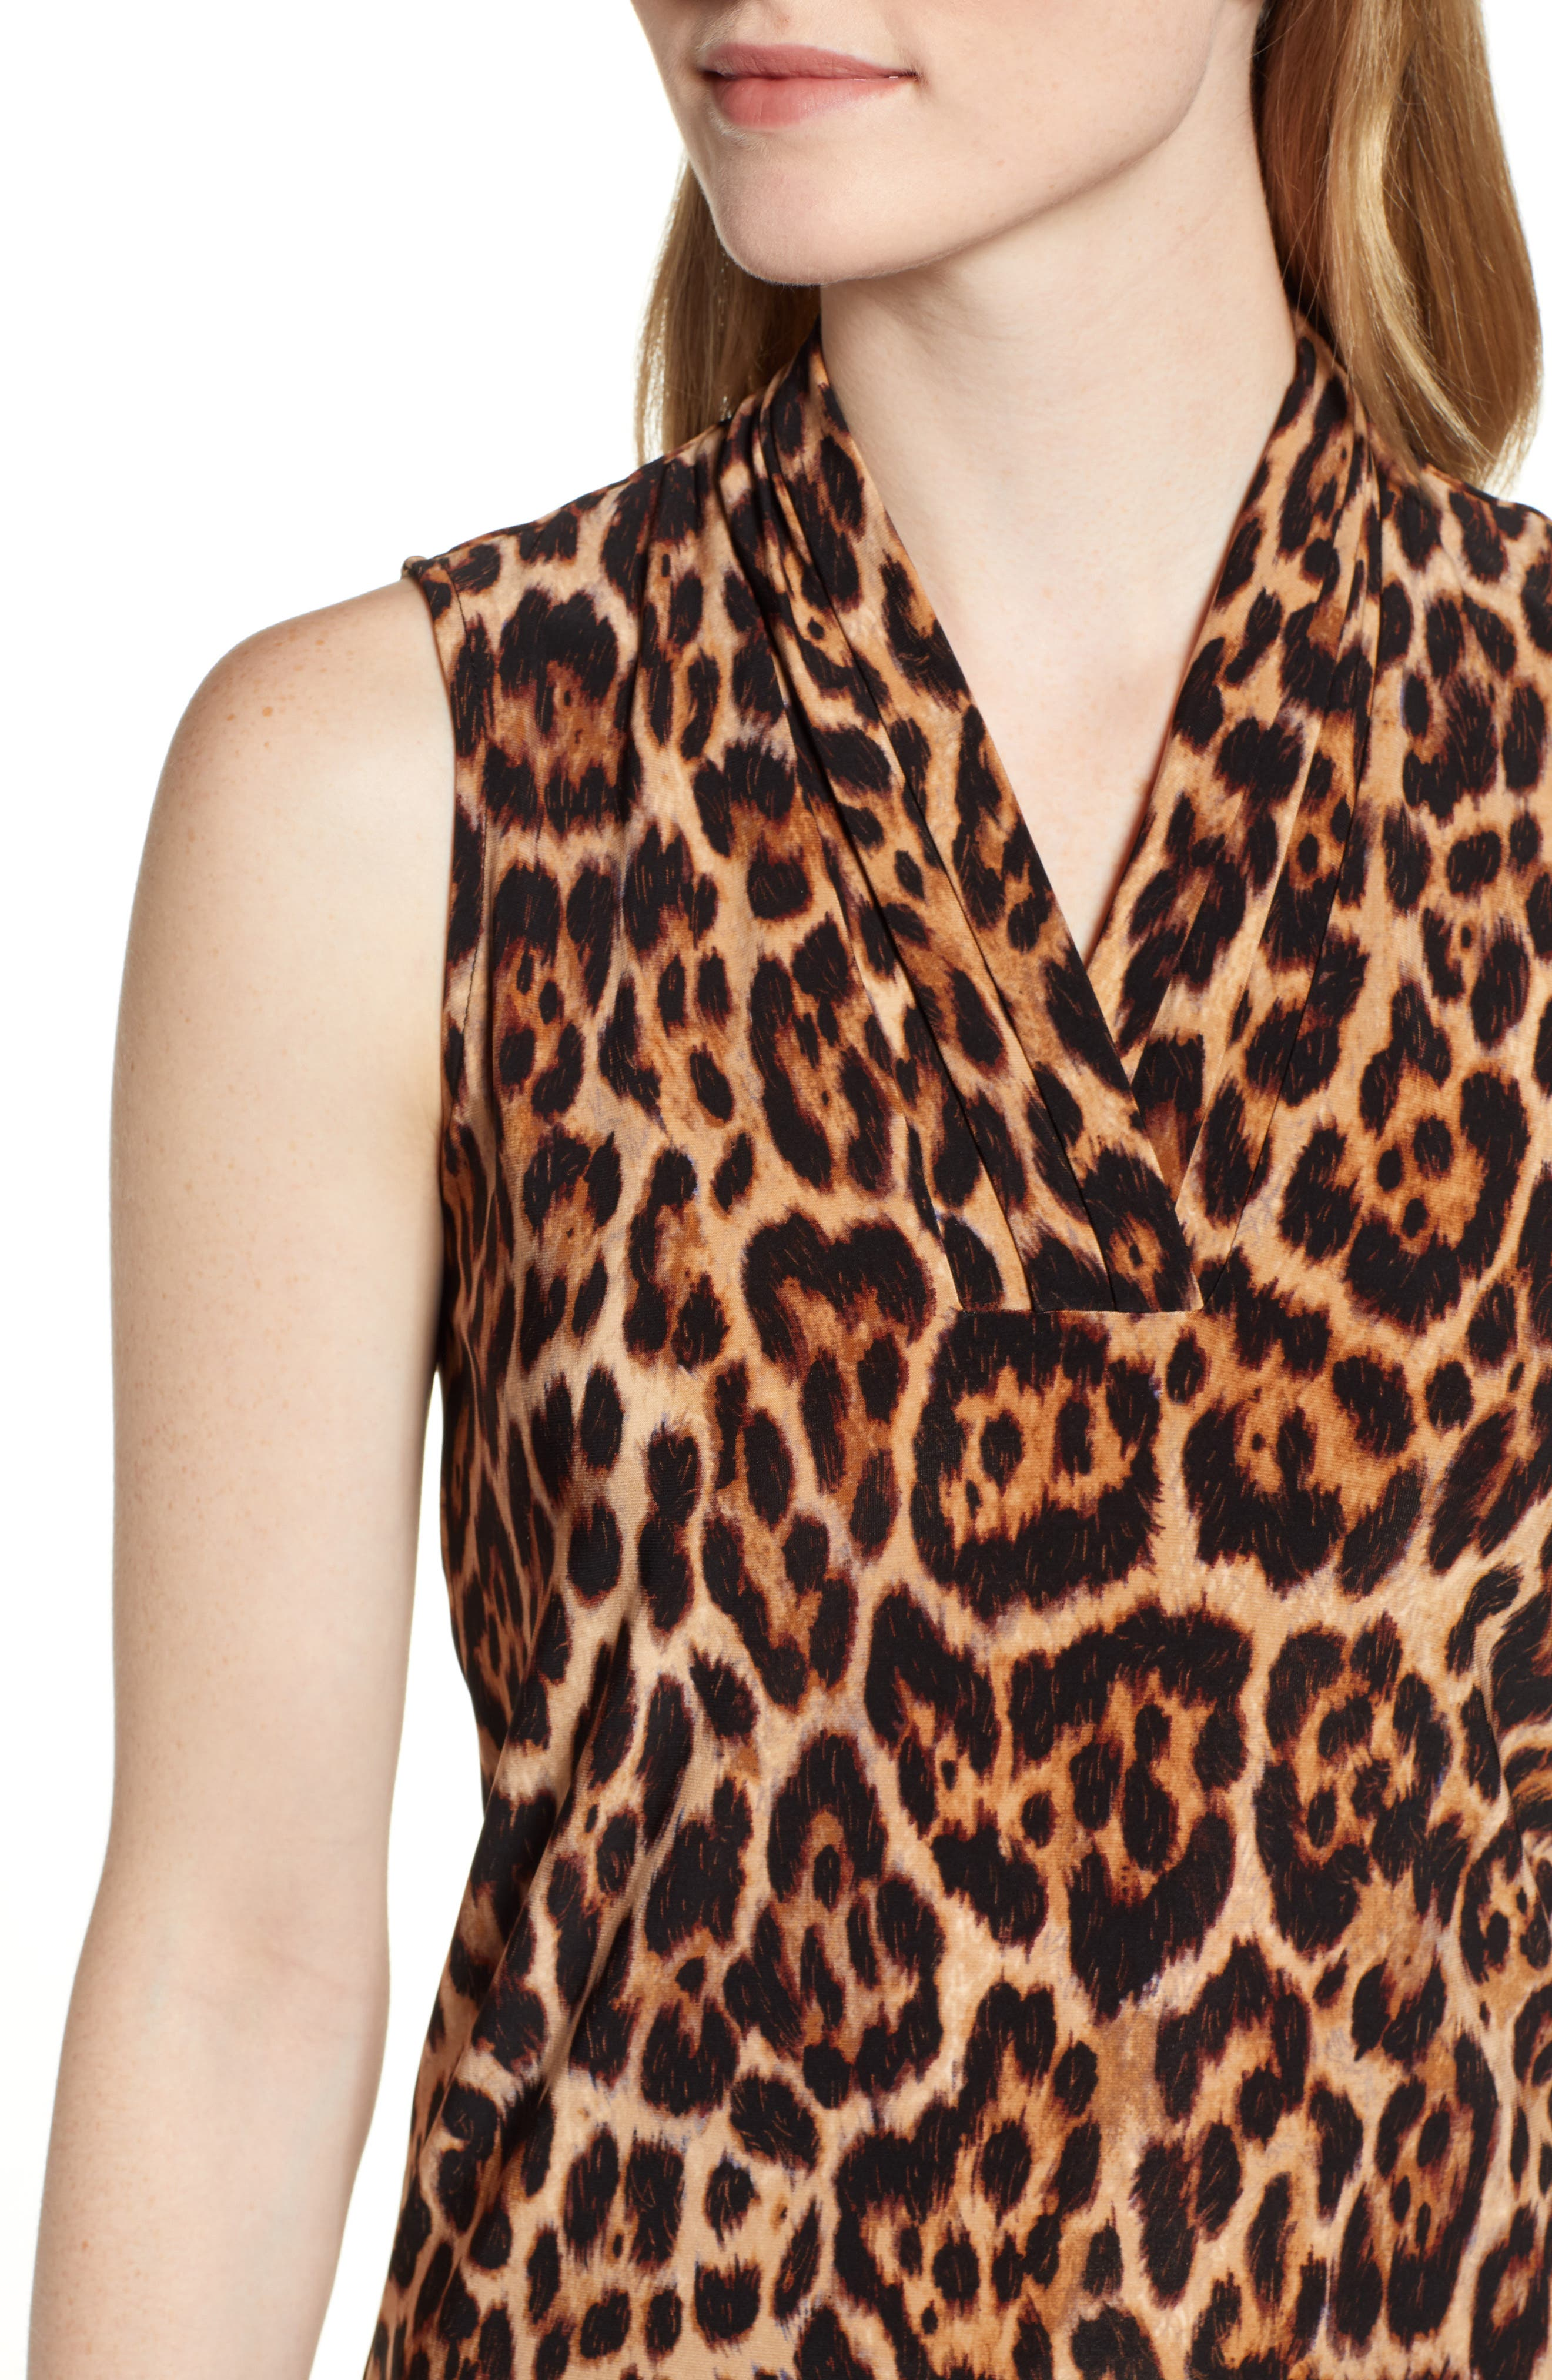 ANNE KLEIN, Animal Print Sleeveless Top, Alternate thumbnail 4, color, SIENA COMBO